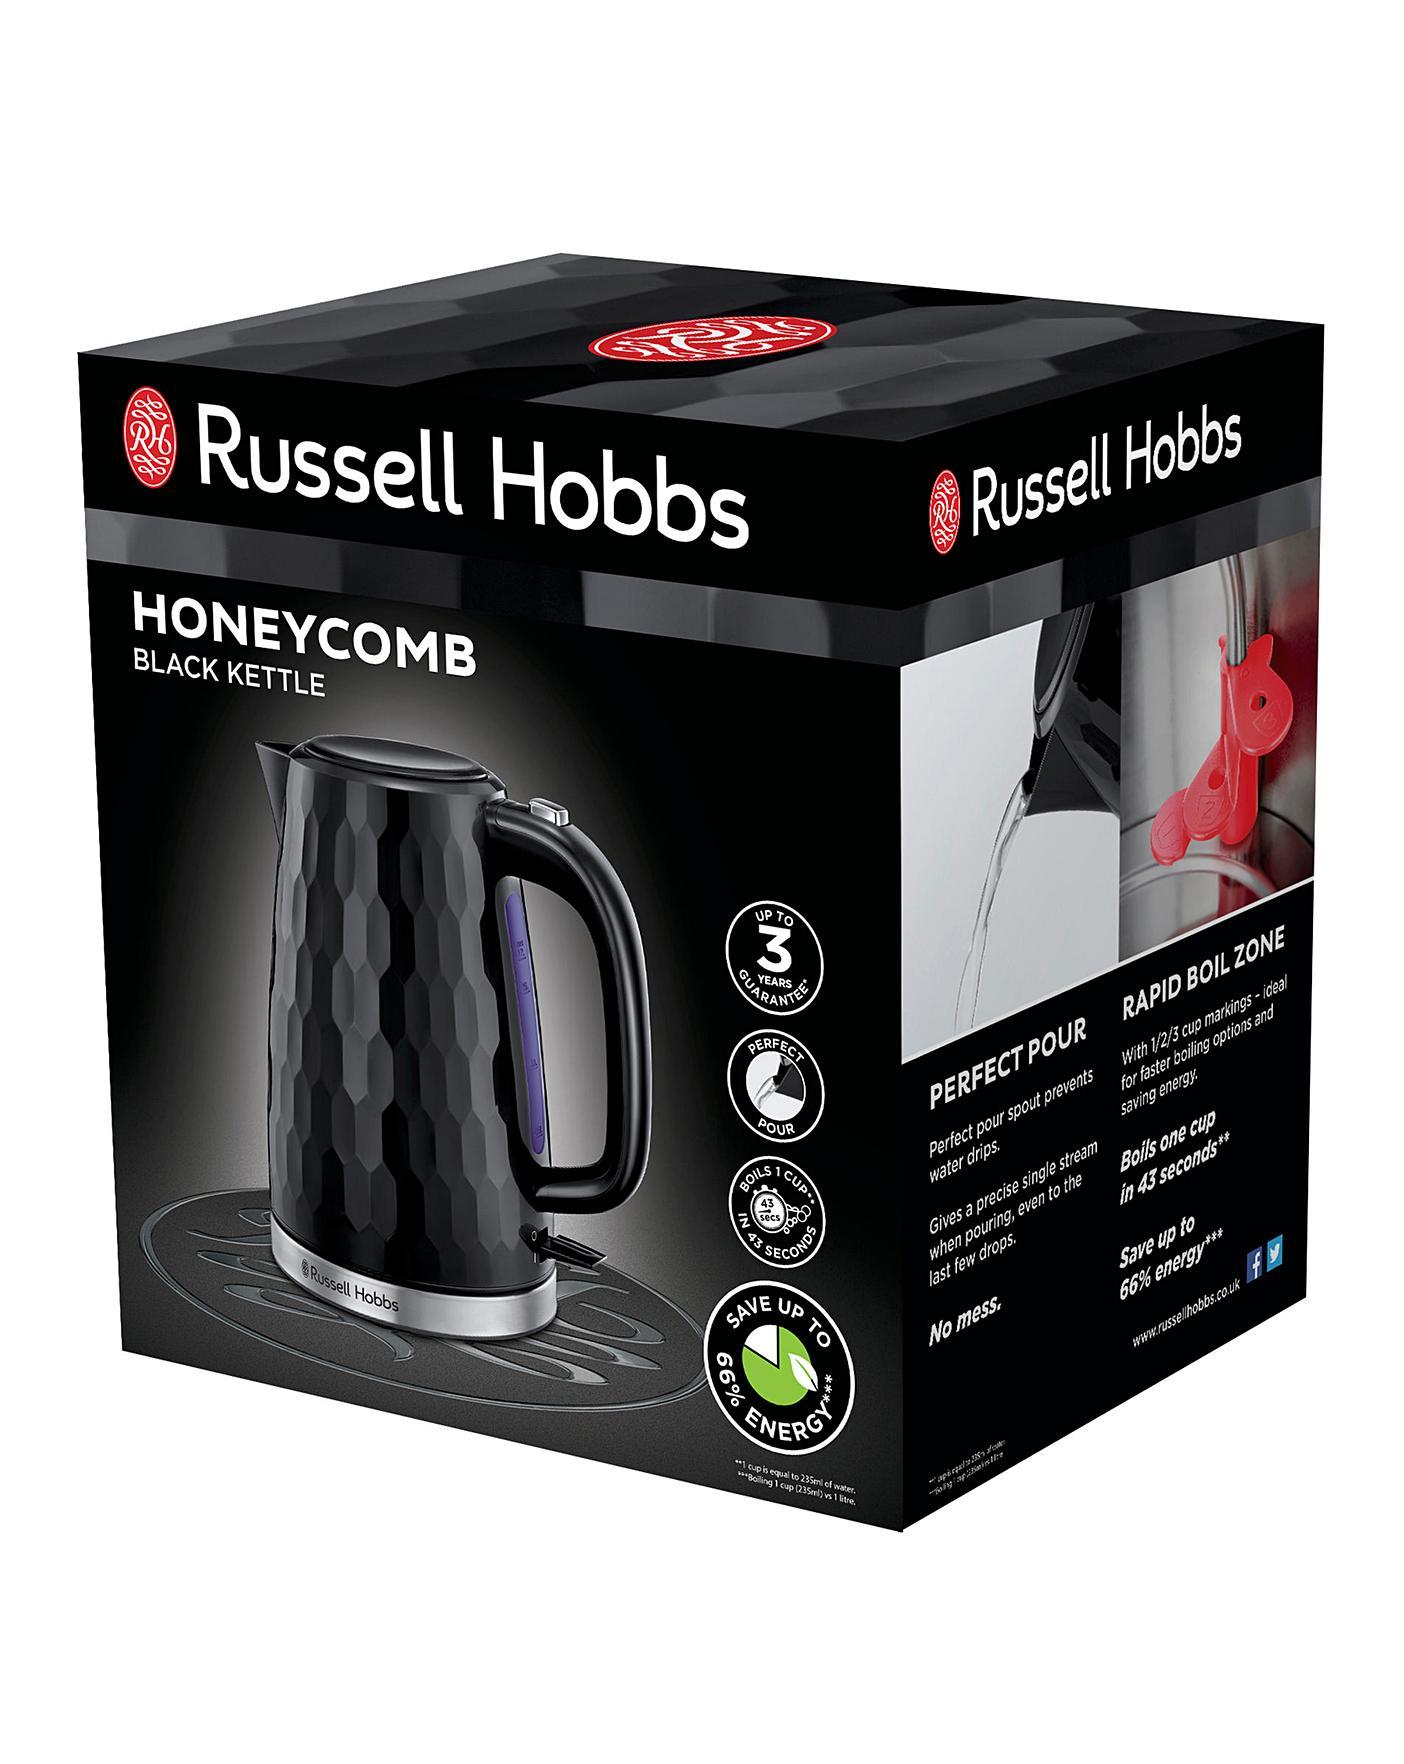 Buy Russell Hobbs 26051 Honeycomb